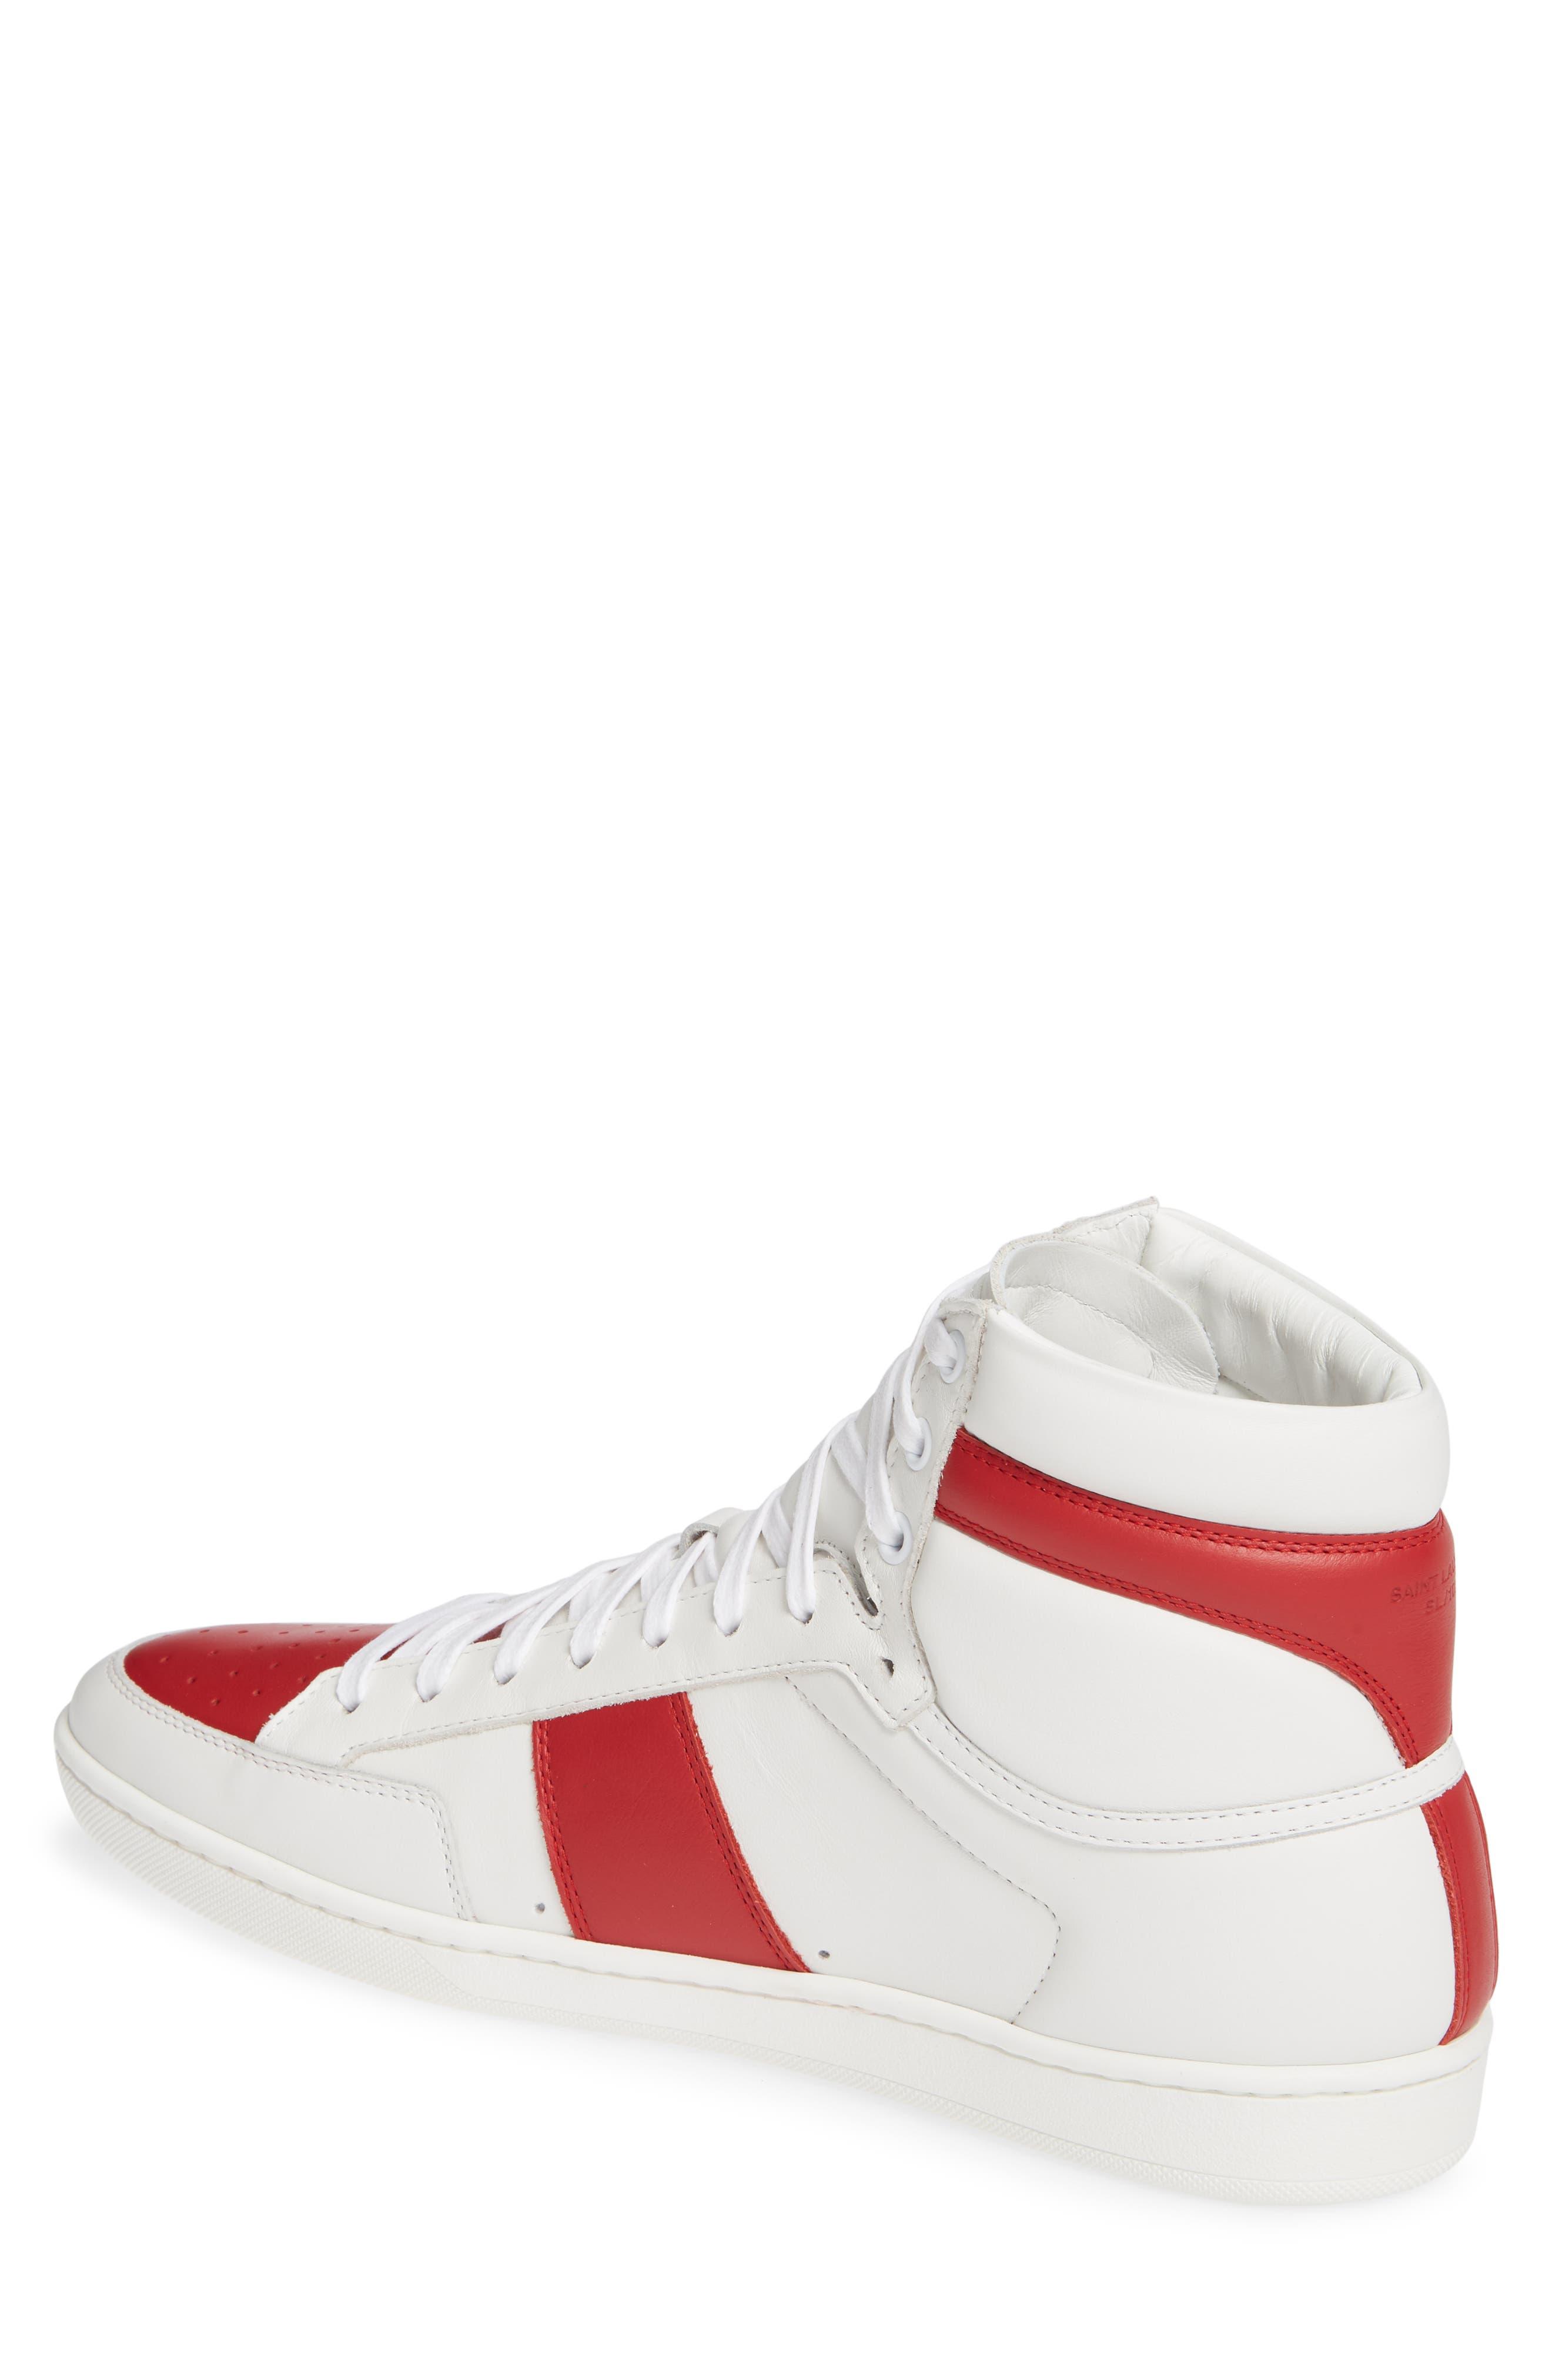 SAINT LAURENT, SL/10H Signature Court Classic High-Top Sneaker, Alternate thumbnail 2, color, WHITE/ MULTI